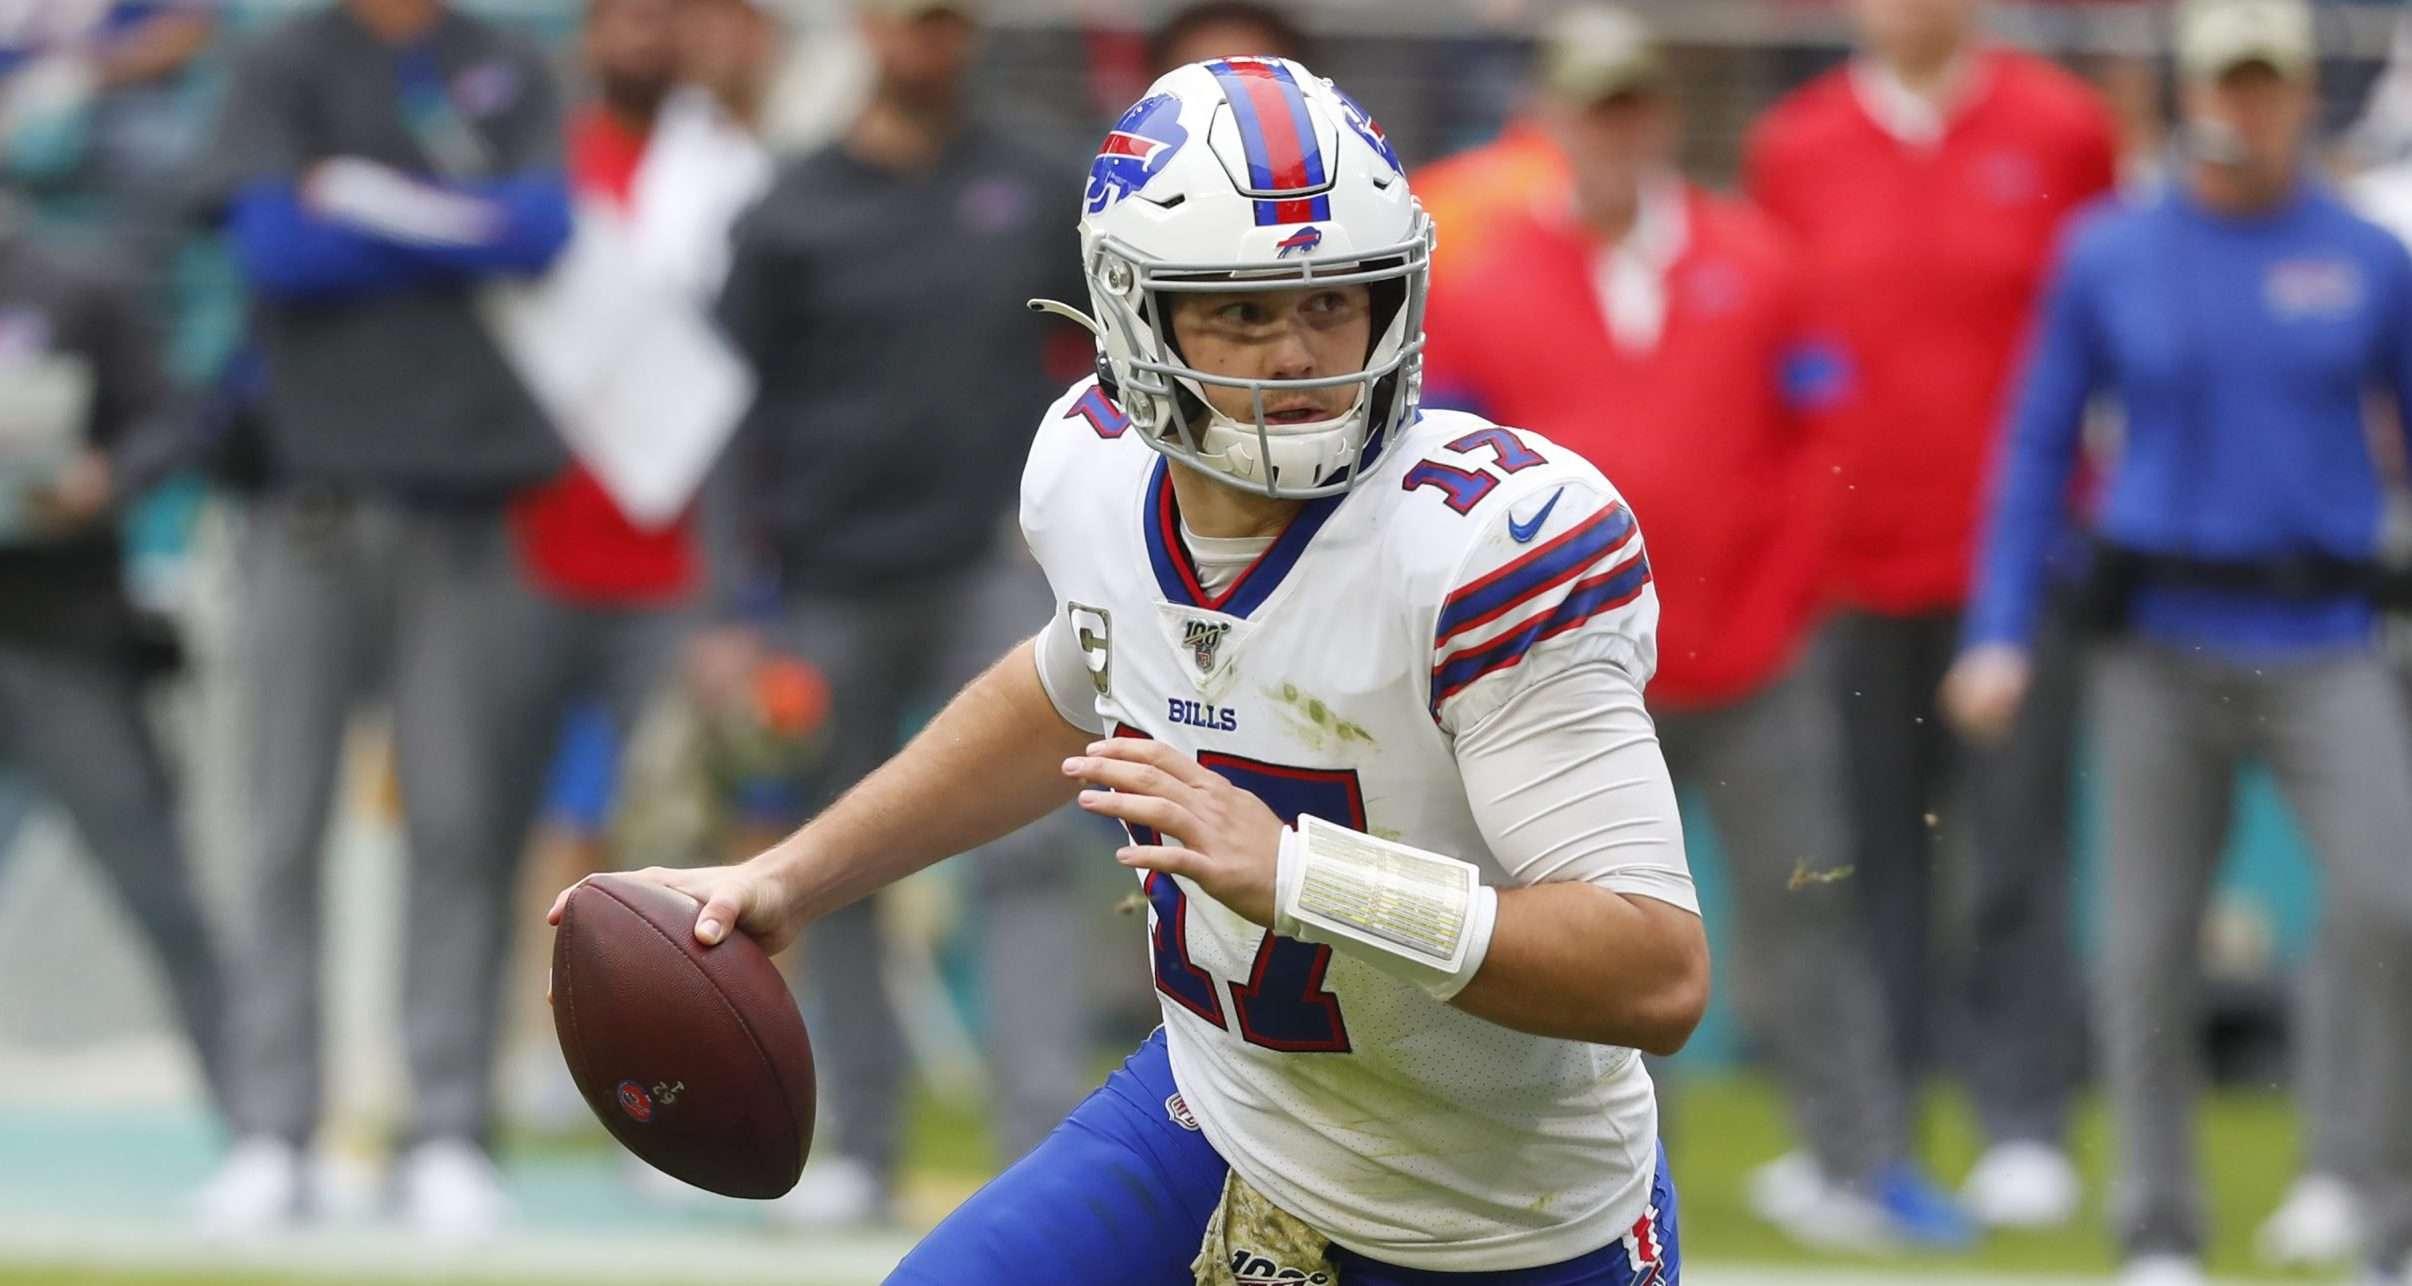 Josh Allen-Buffalo Bills-New England Patriots-Tom Brady-O.J. Howard-Tampa Bay Buccaneers-Houston Texans-Jameis Winston-Julian Edelman-Julian Edlow-